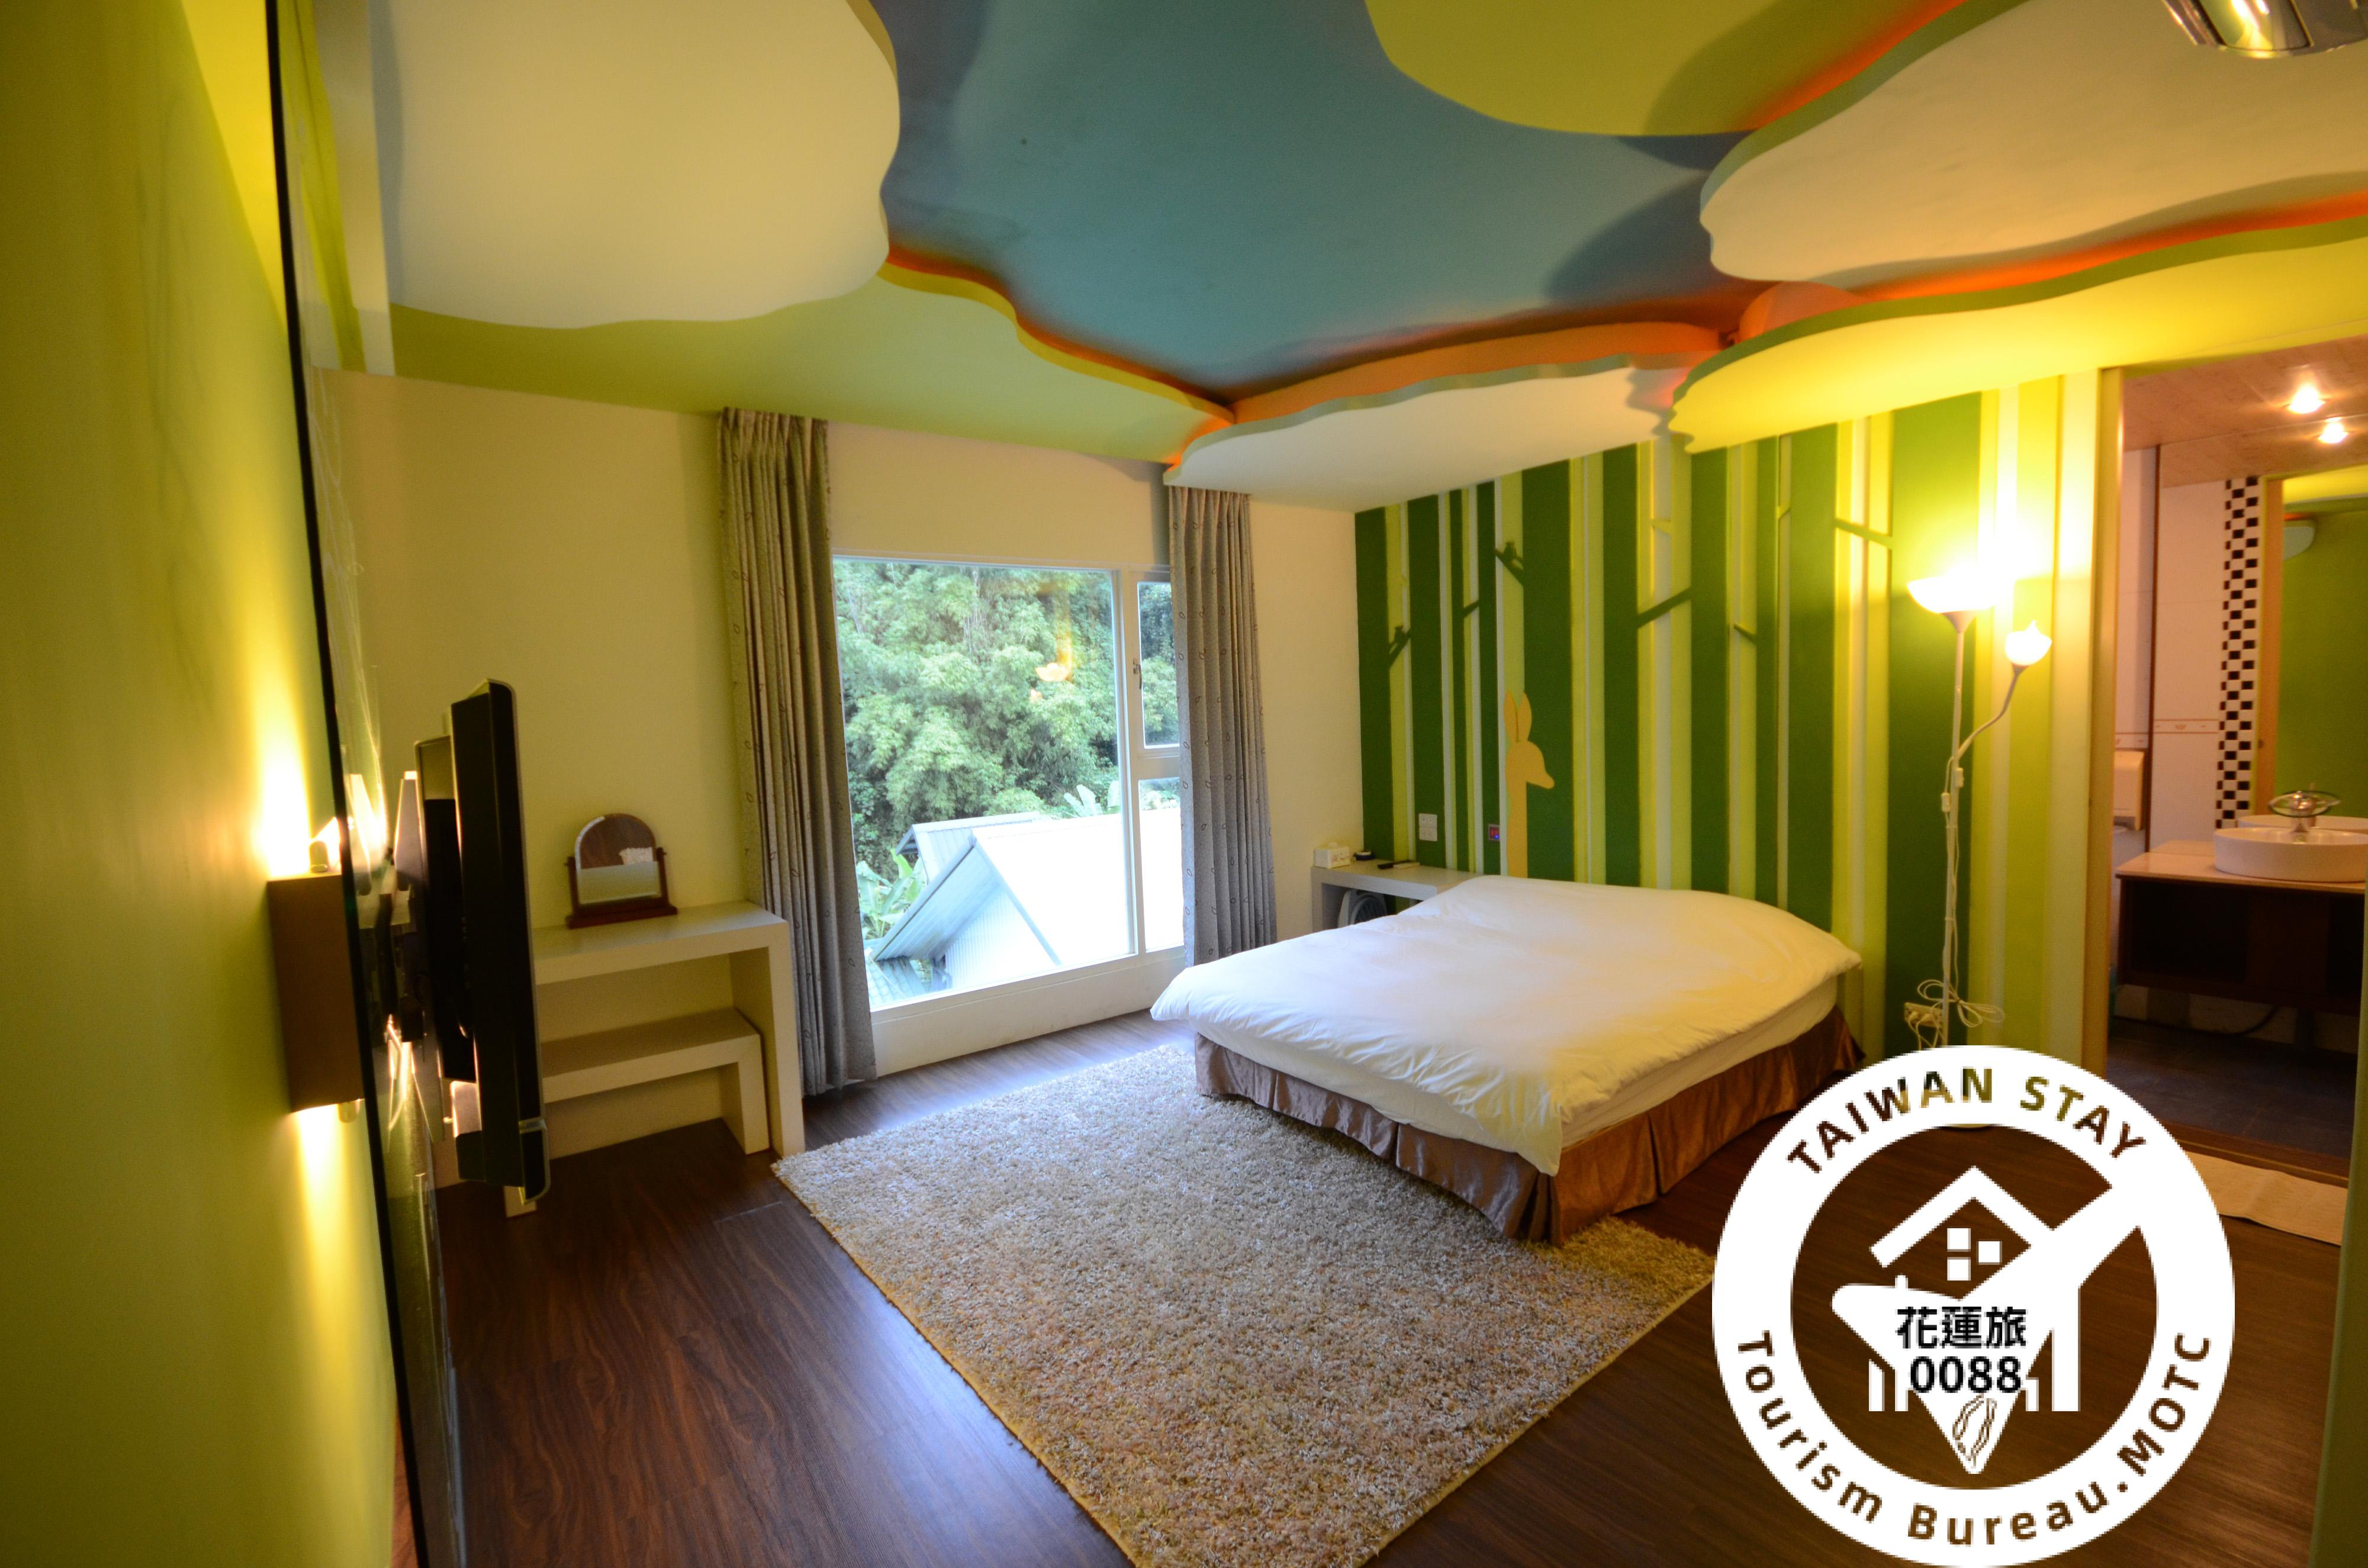 Yezi Lin Hot Spring Hotel